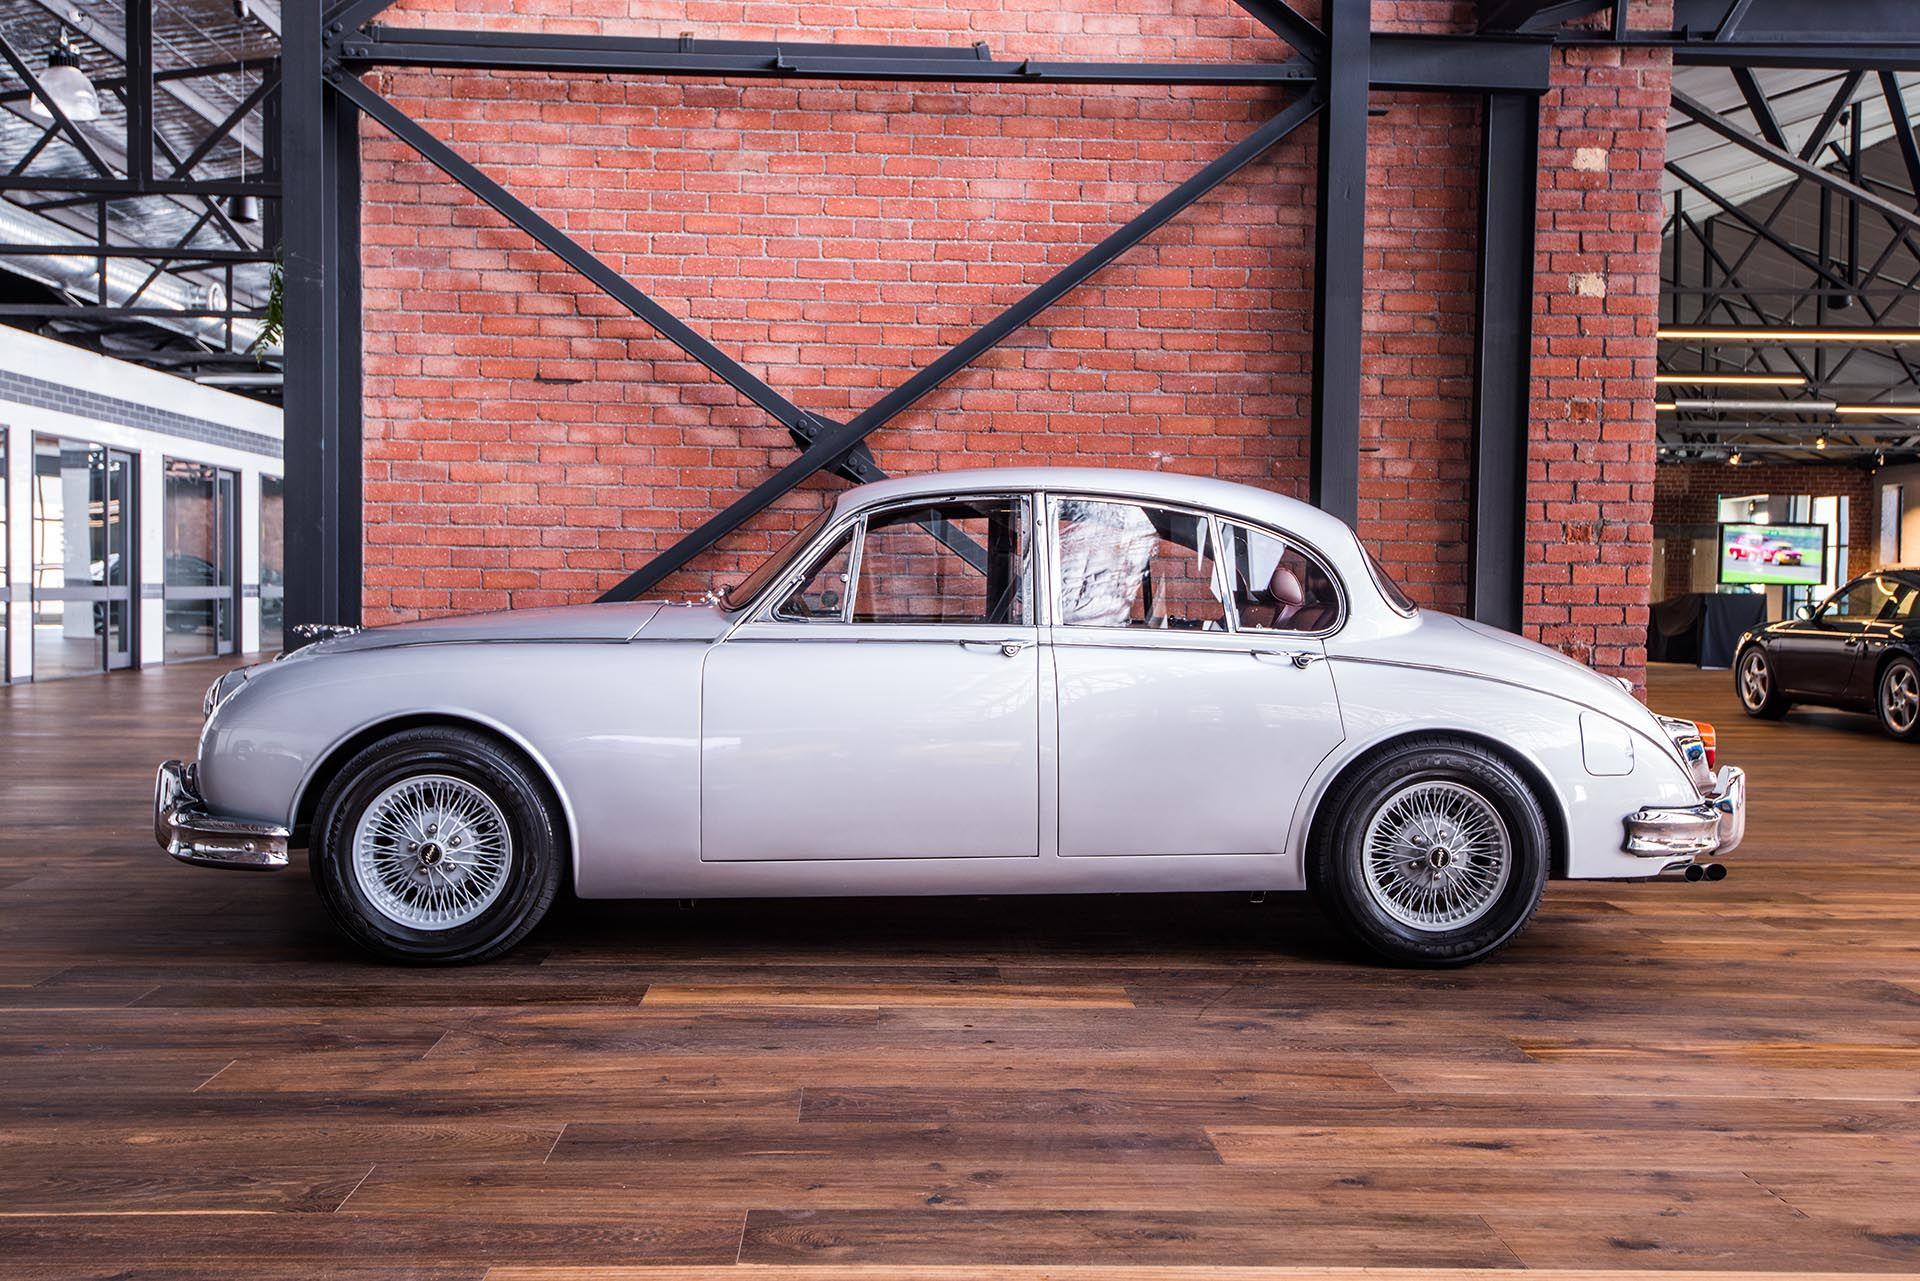 1959 Jaguar Mk ll 3.8 manual - Richmonds - Classic and Prestige Cars ...